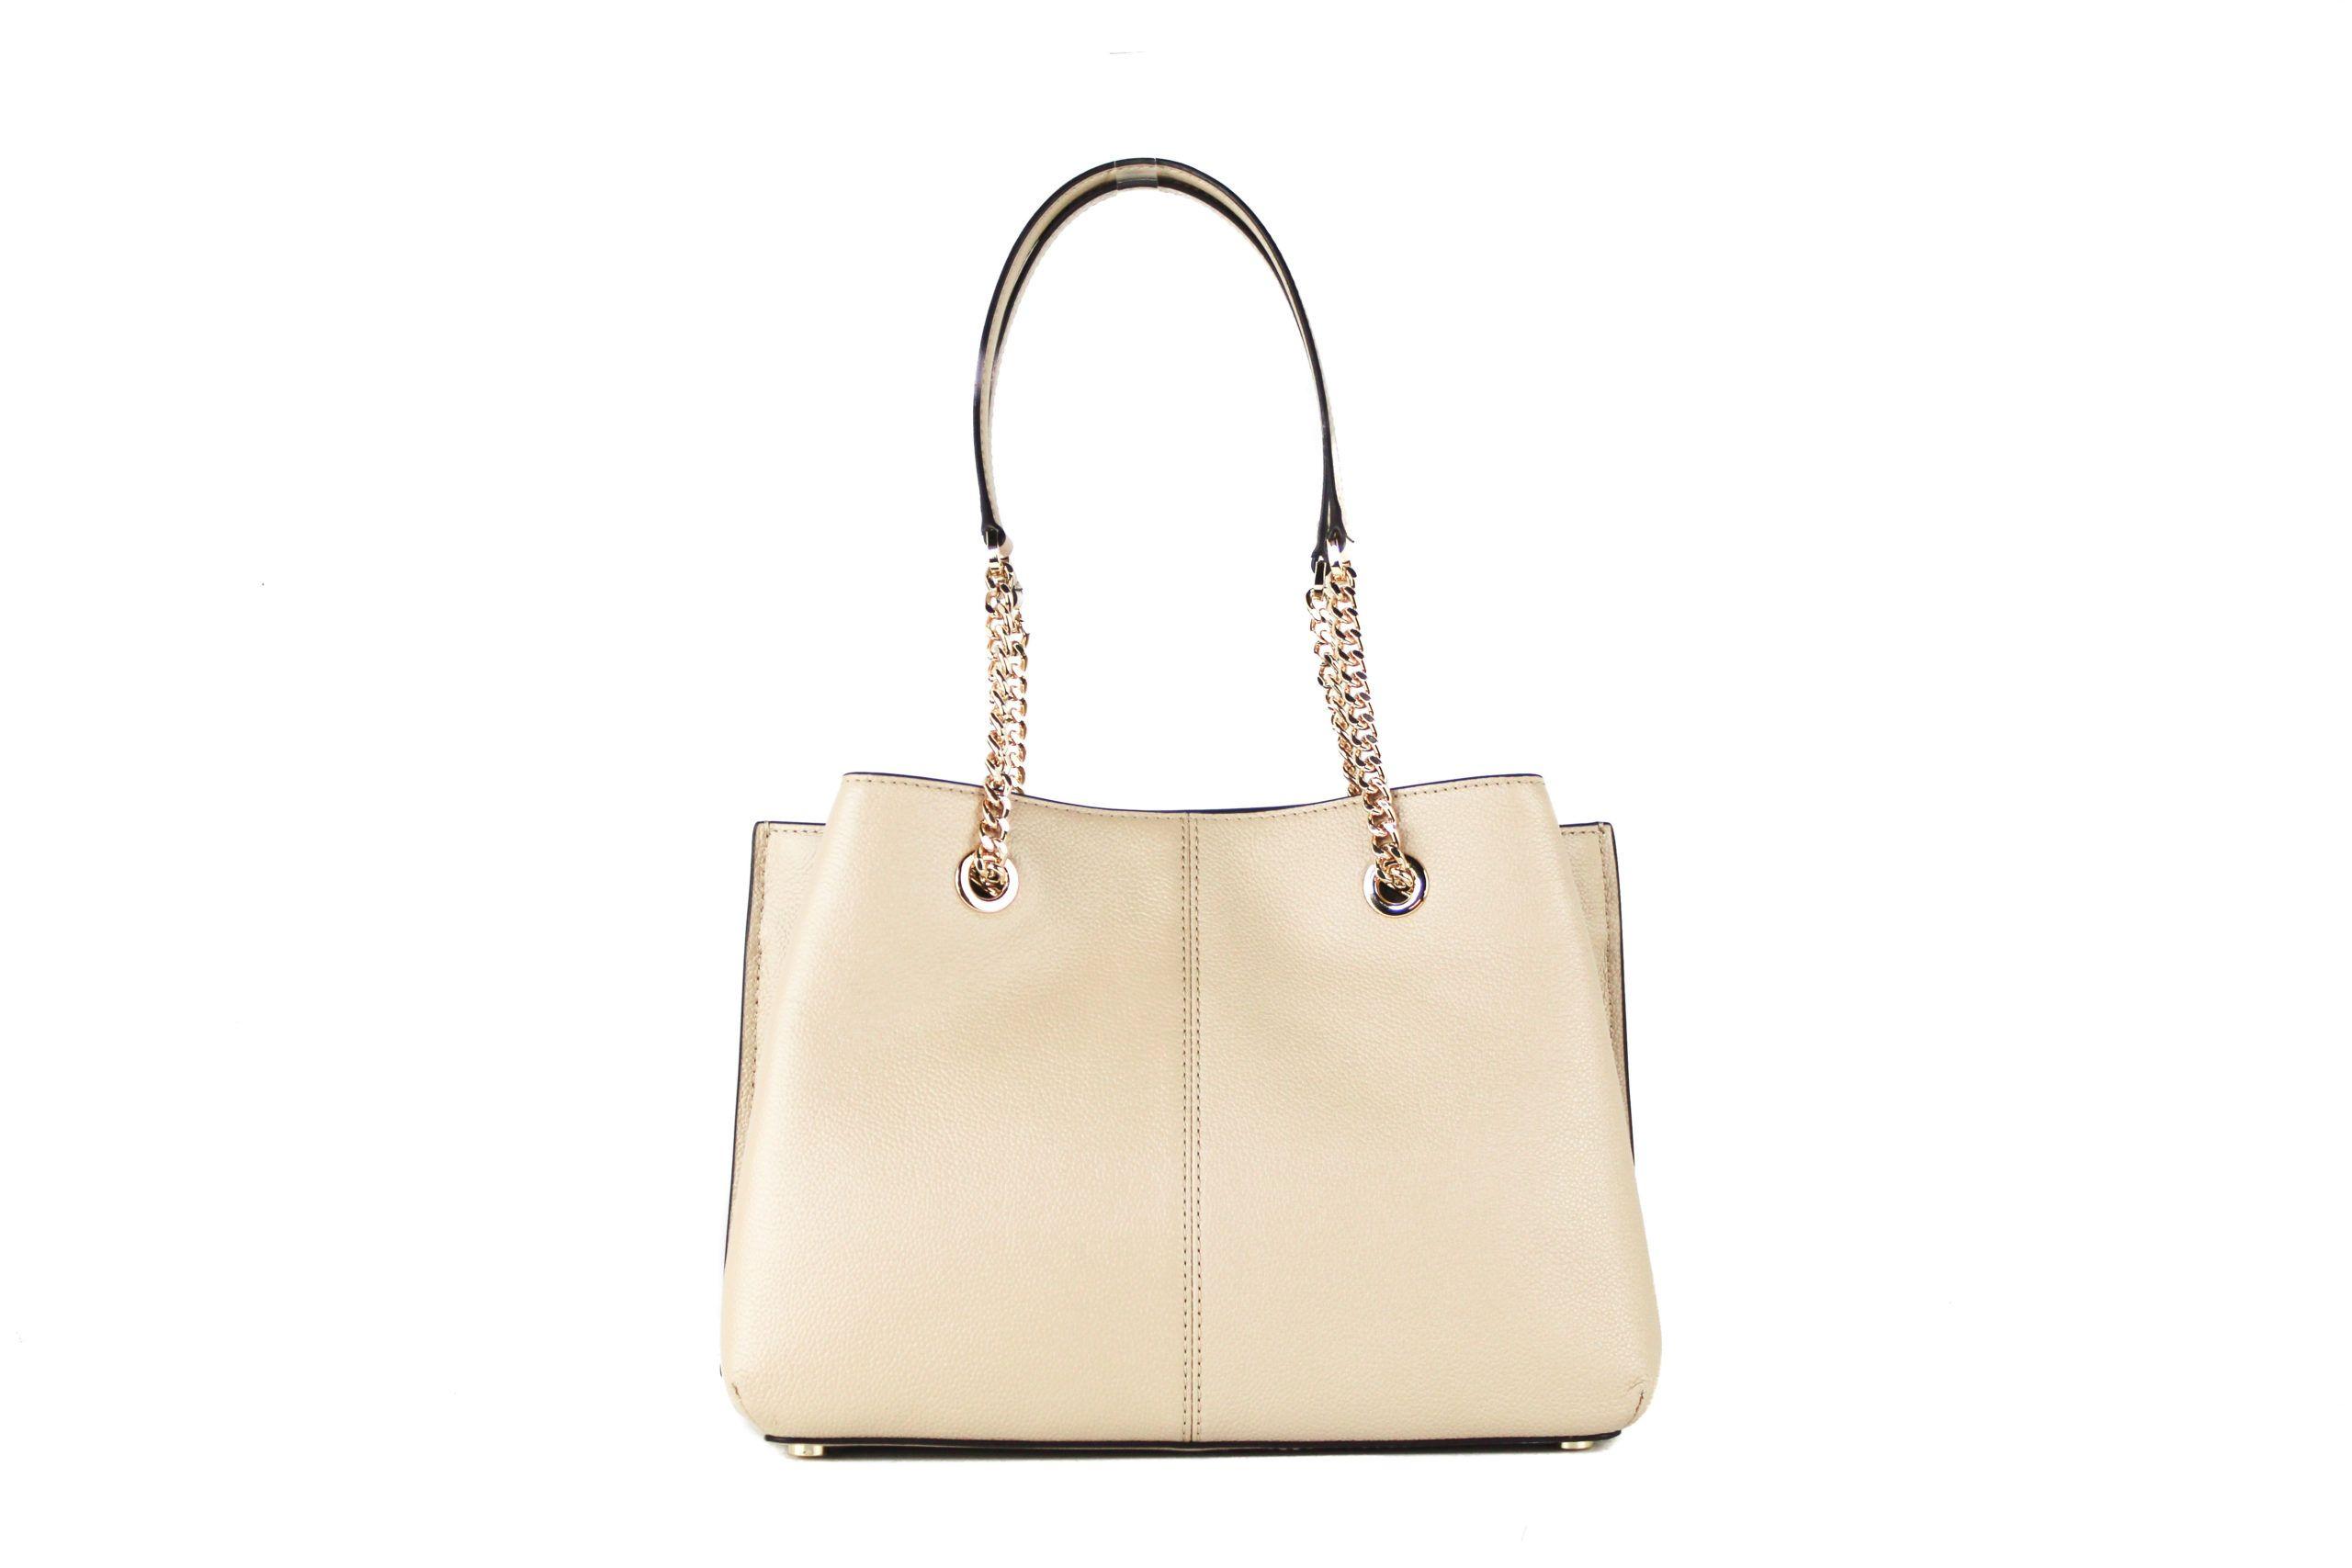 Michael Kors Teagen Large Leather Long Drop Satchel Handbag (Bisque Solid)